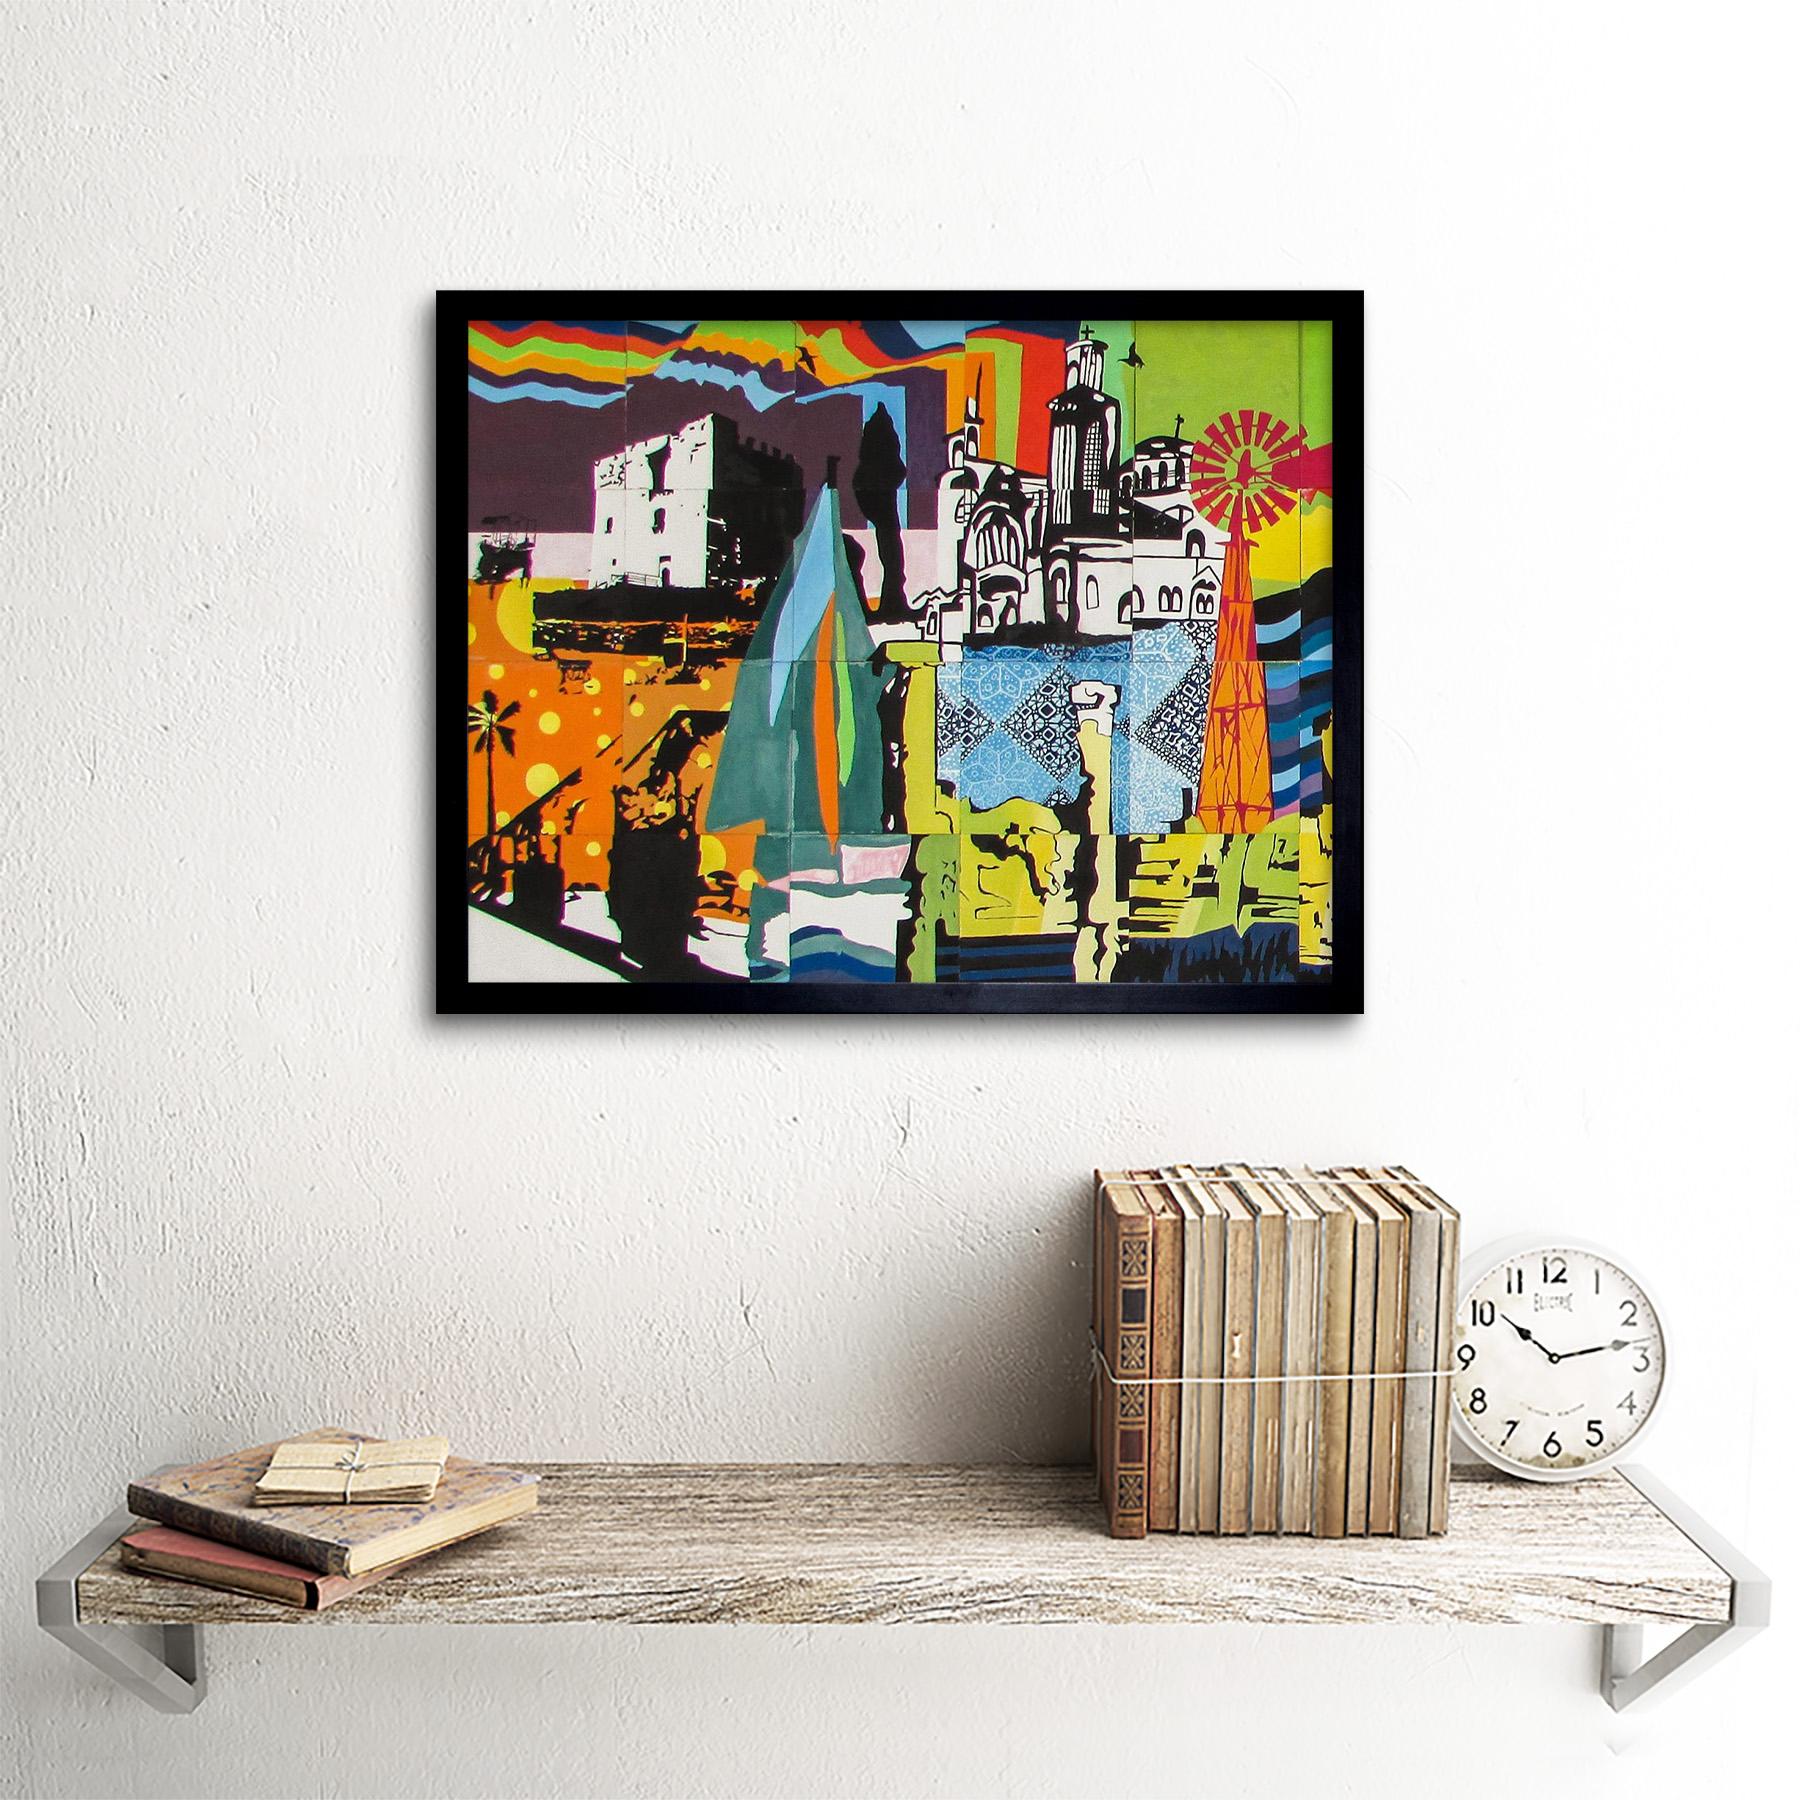 Graffiti-Mural-Paralimni-primaria-de-Chipre-Impresion-de-Arte-Decoracion-De-Pared-Poster-Enmarcado miniatura 3